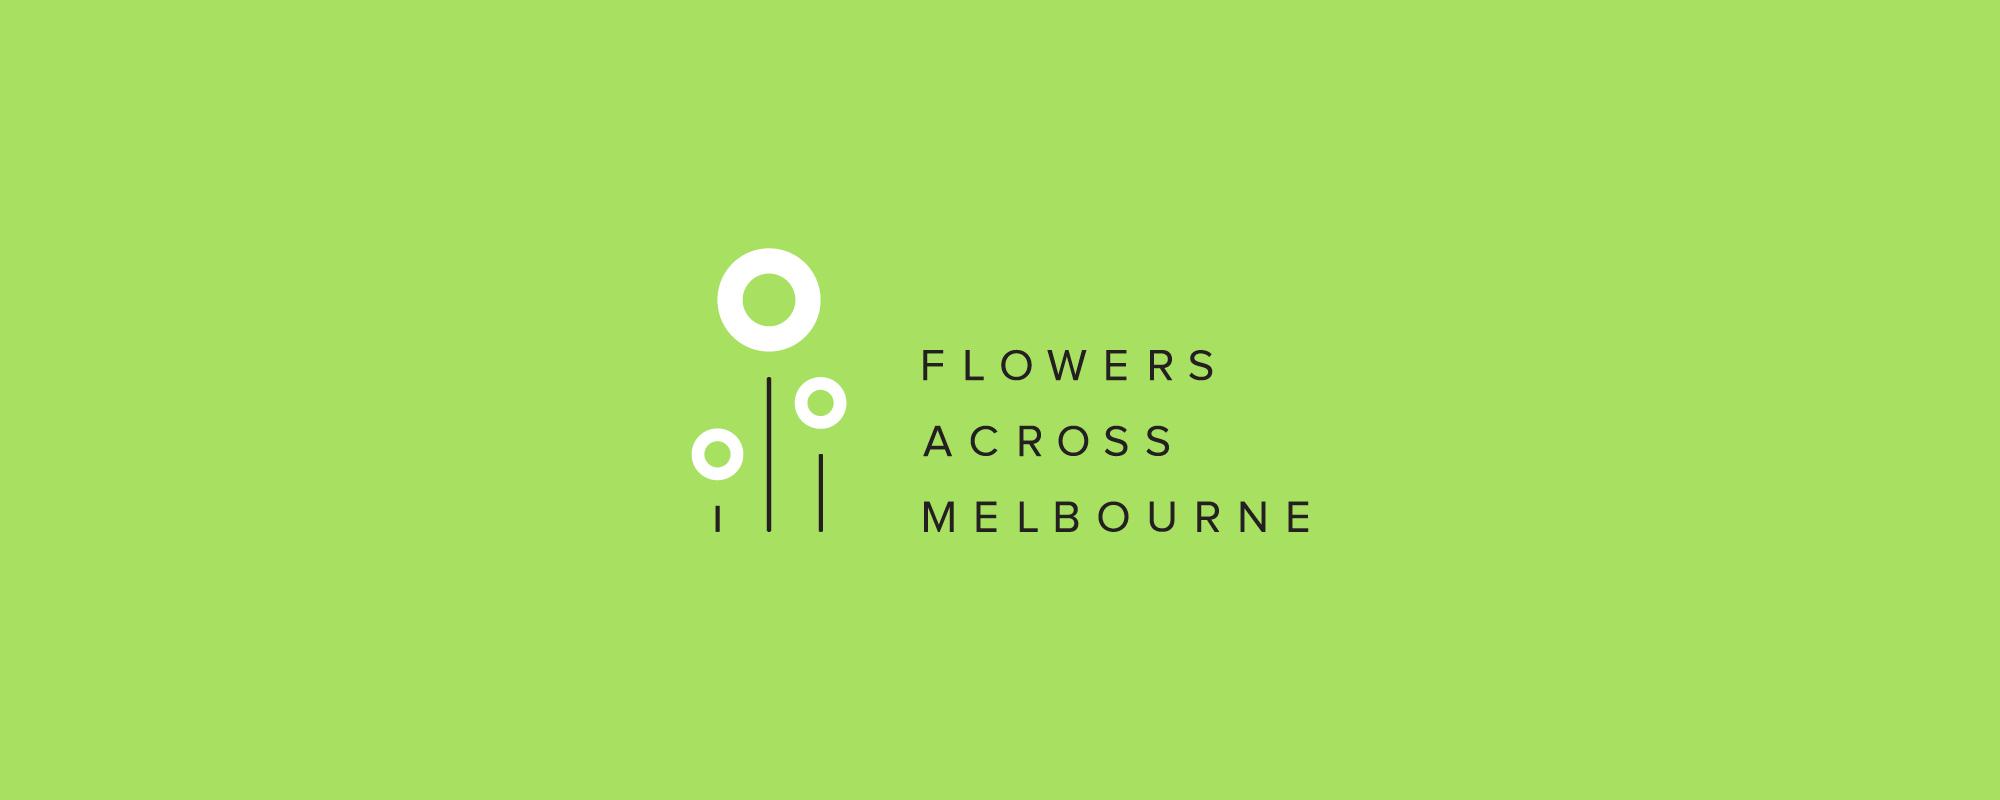 Flowers Across Melbourne Cover Image.jpg